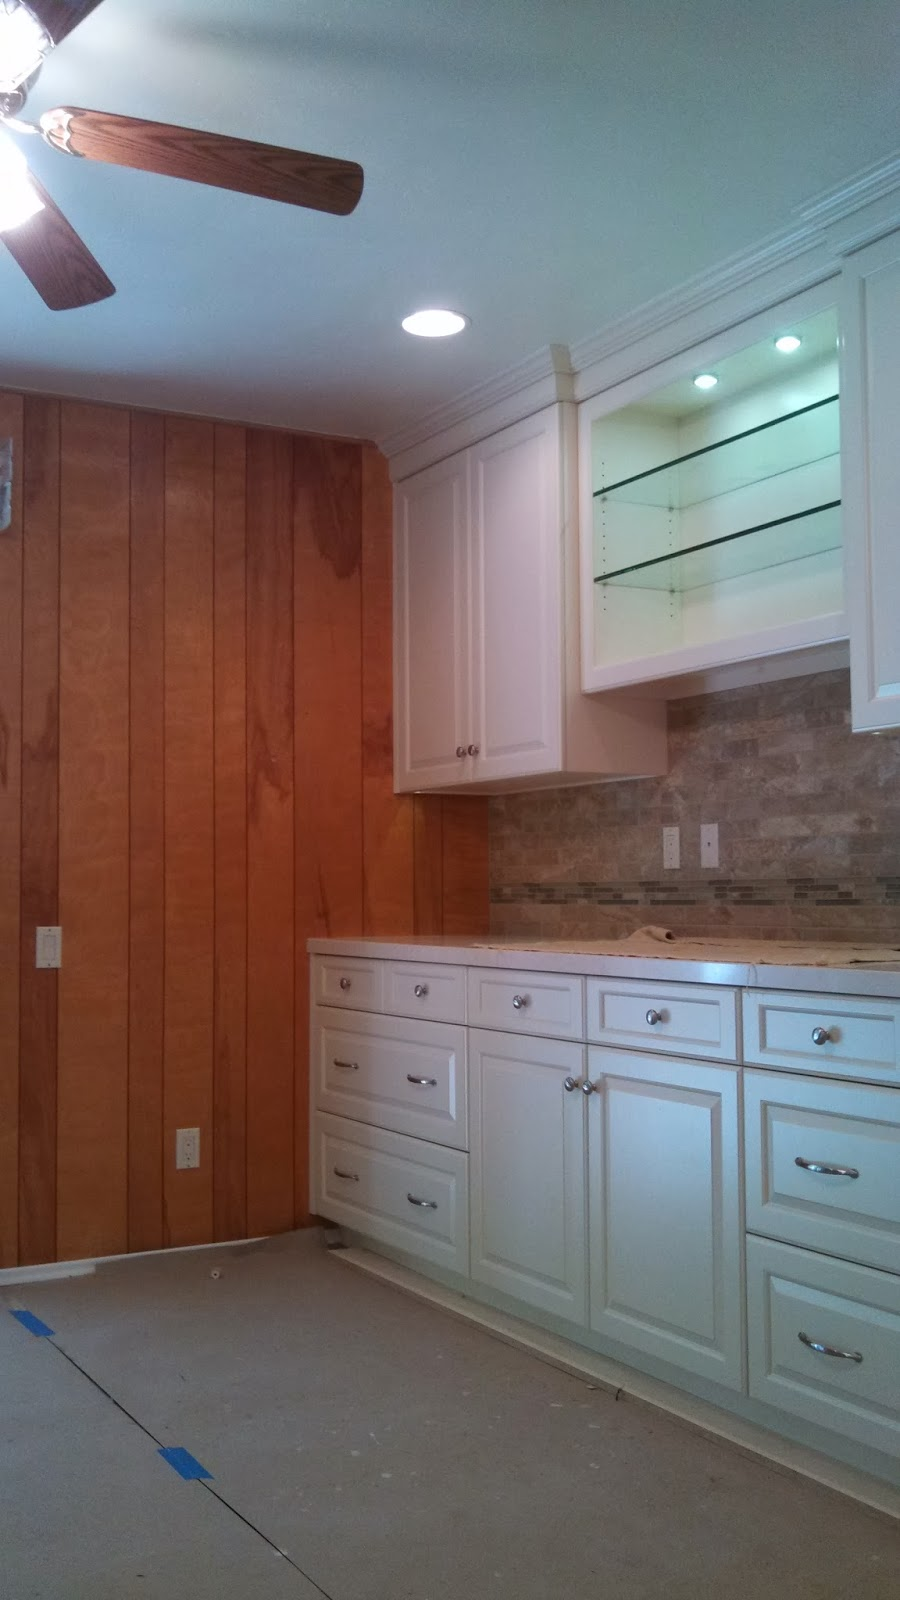 Brilliant Electric Kitchen Remodel Amp Complete Rewire With